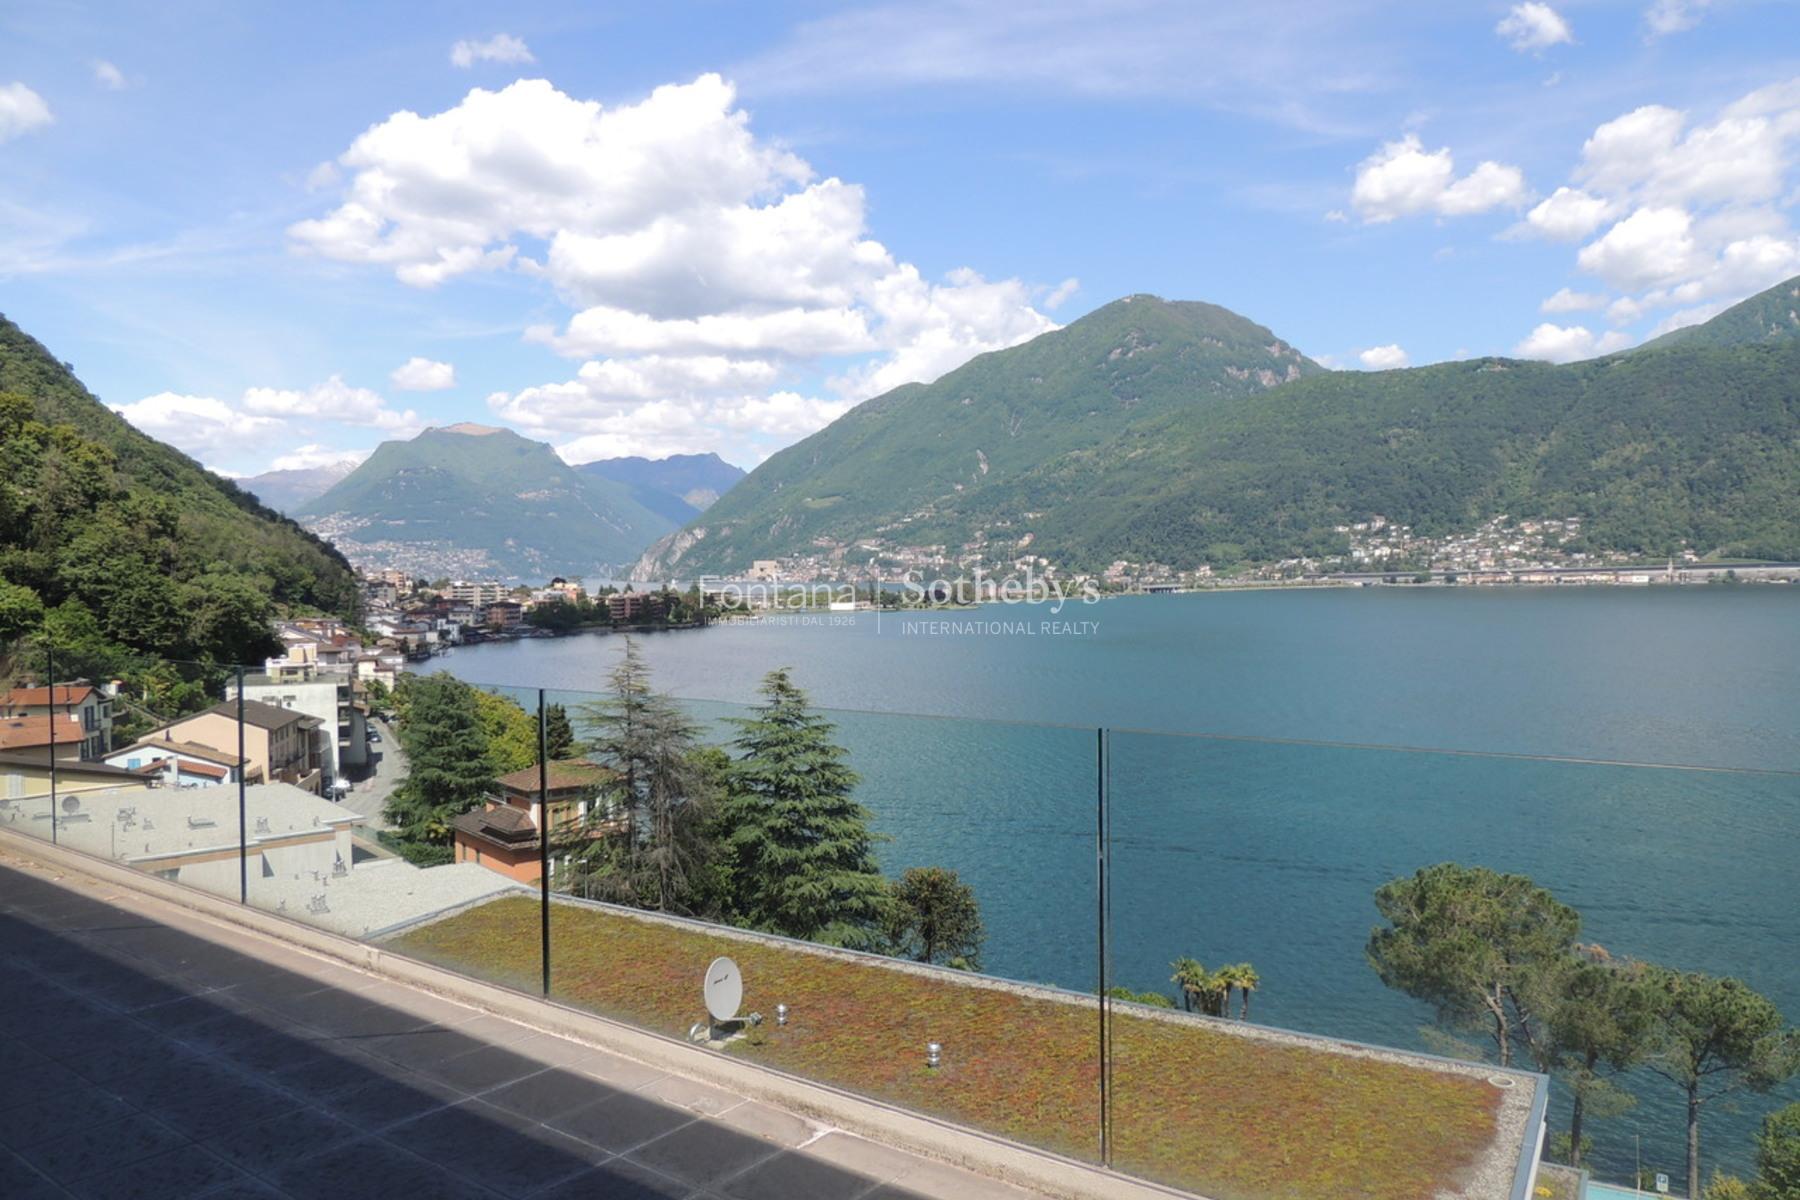 Квартира для того Продажа на Modern duplex penthouse with magnificent lake view - a real Bijoux! Melide Melide, Ticino, 6815 Швейцария